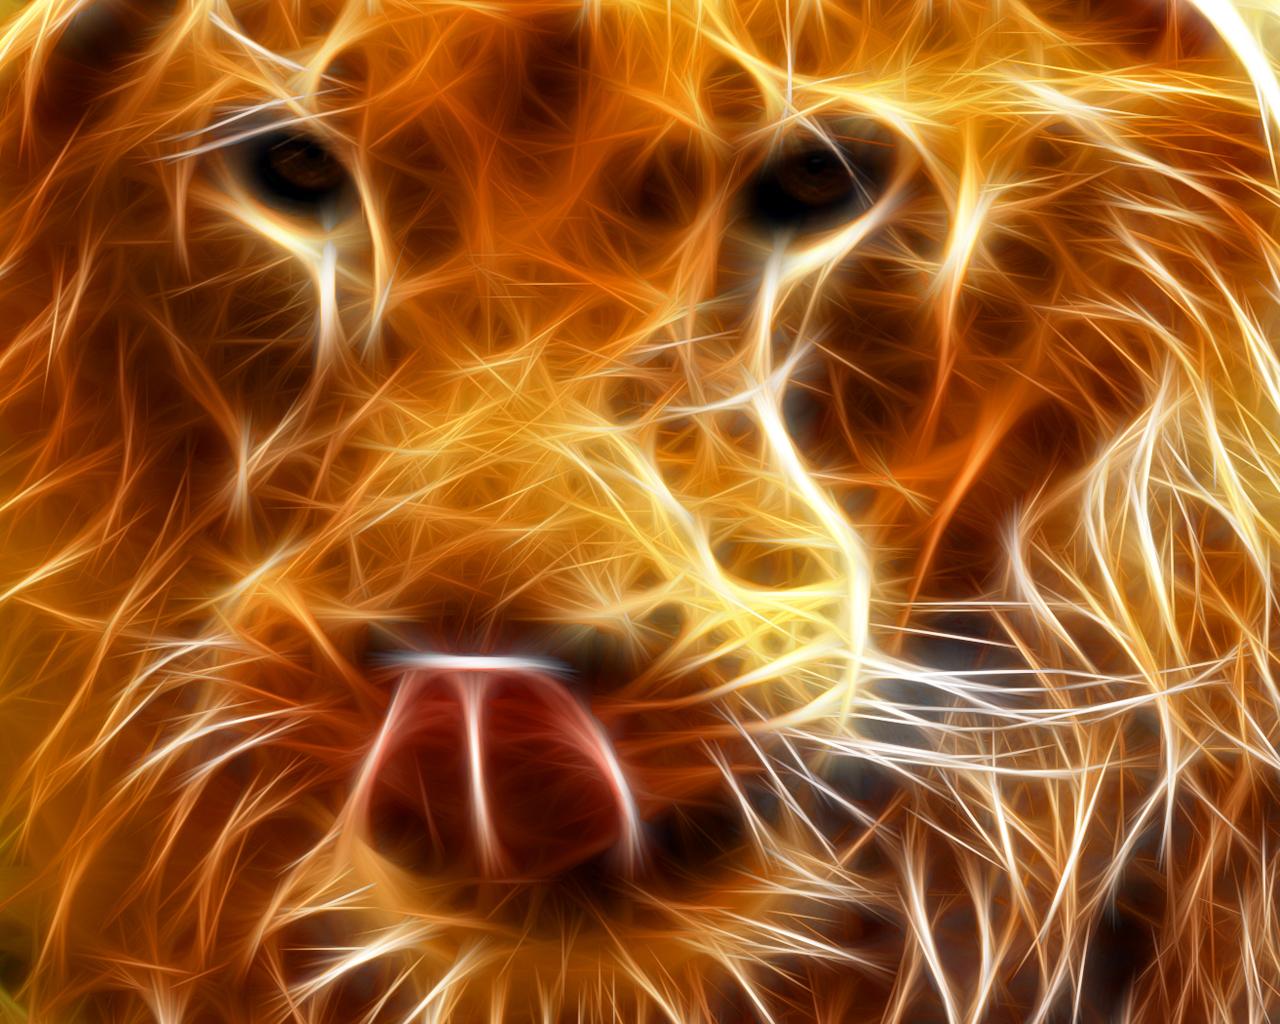 Lion Fire Wallpapers HD wallpapers   Lion Fire Wallpapers 1280x1024